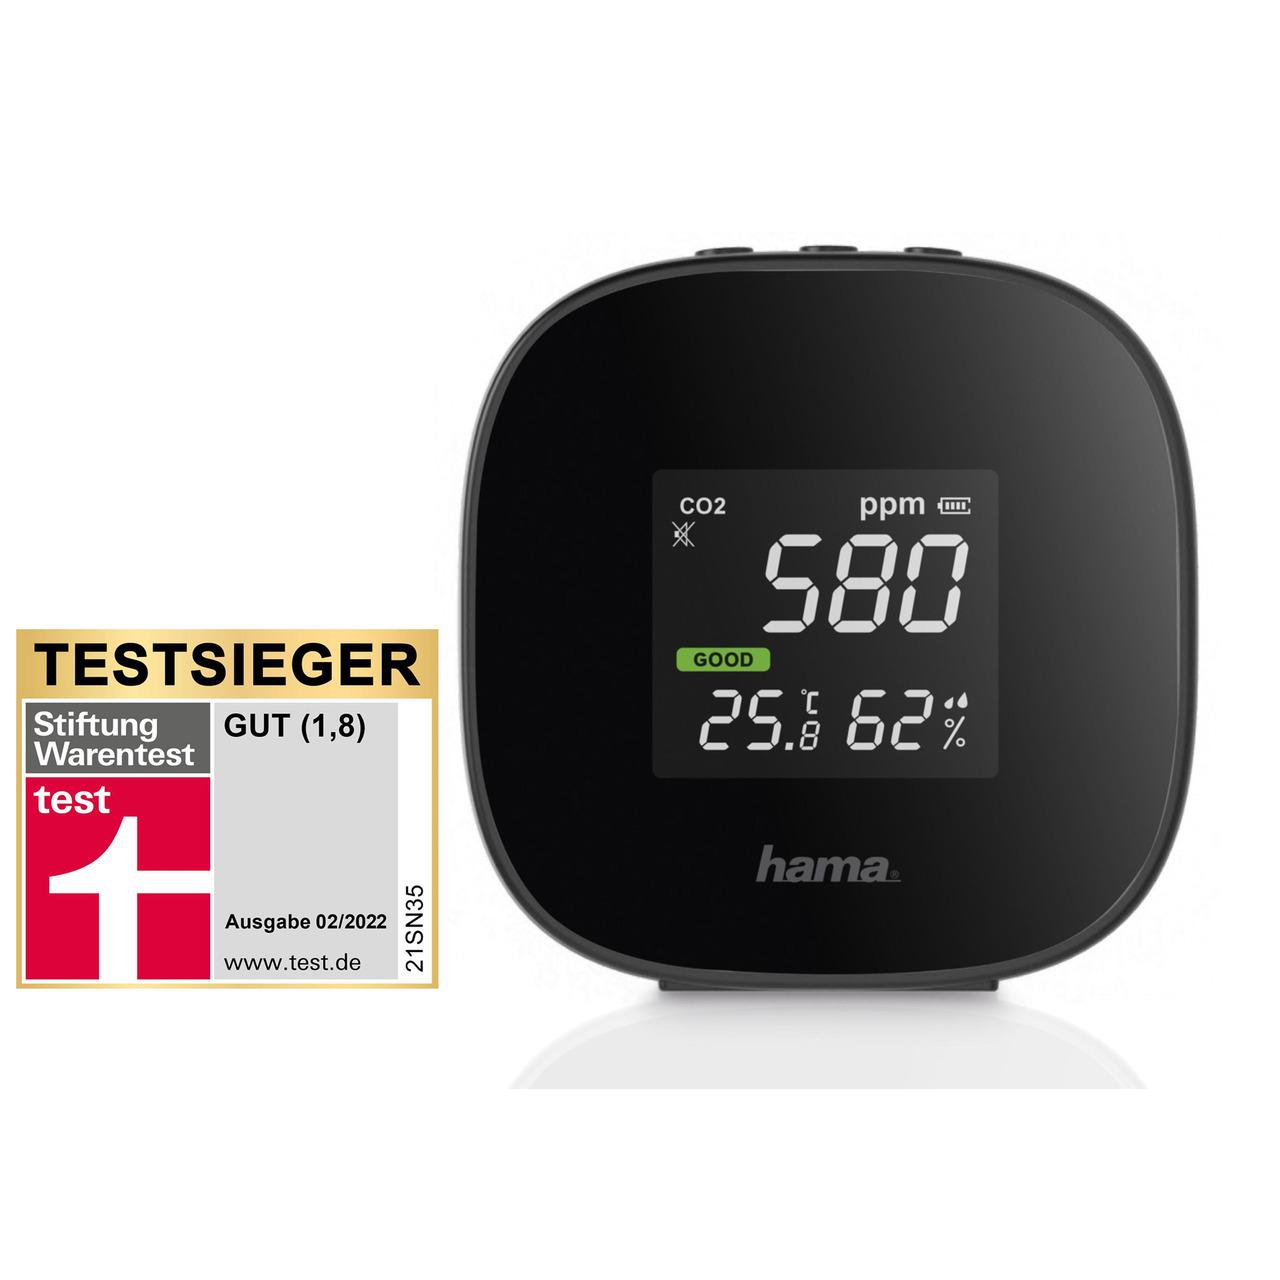 hama CO2-Messgerät - CO2-Anzeige Safe- Kohlendioxid- Ampel-Anzeige- mit integriertem Akku